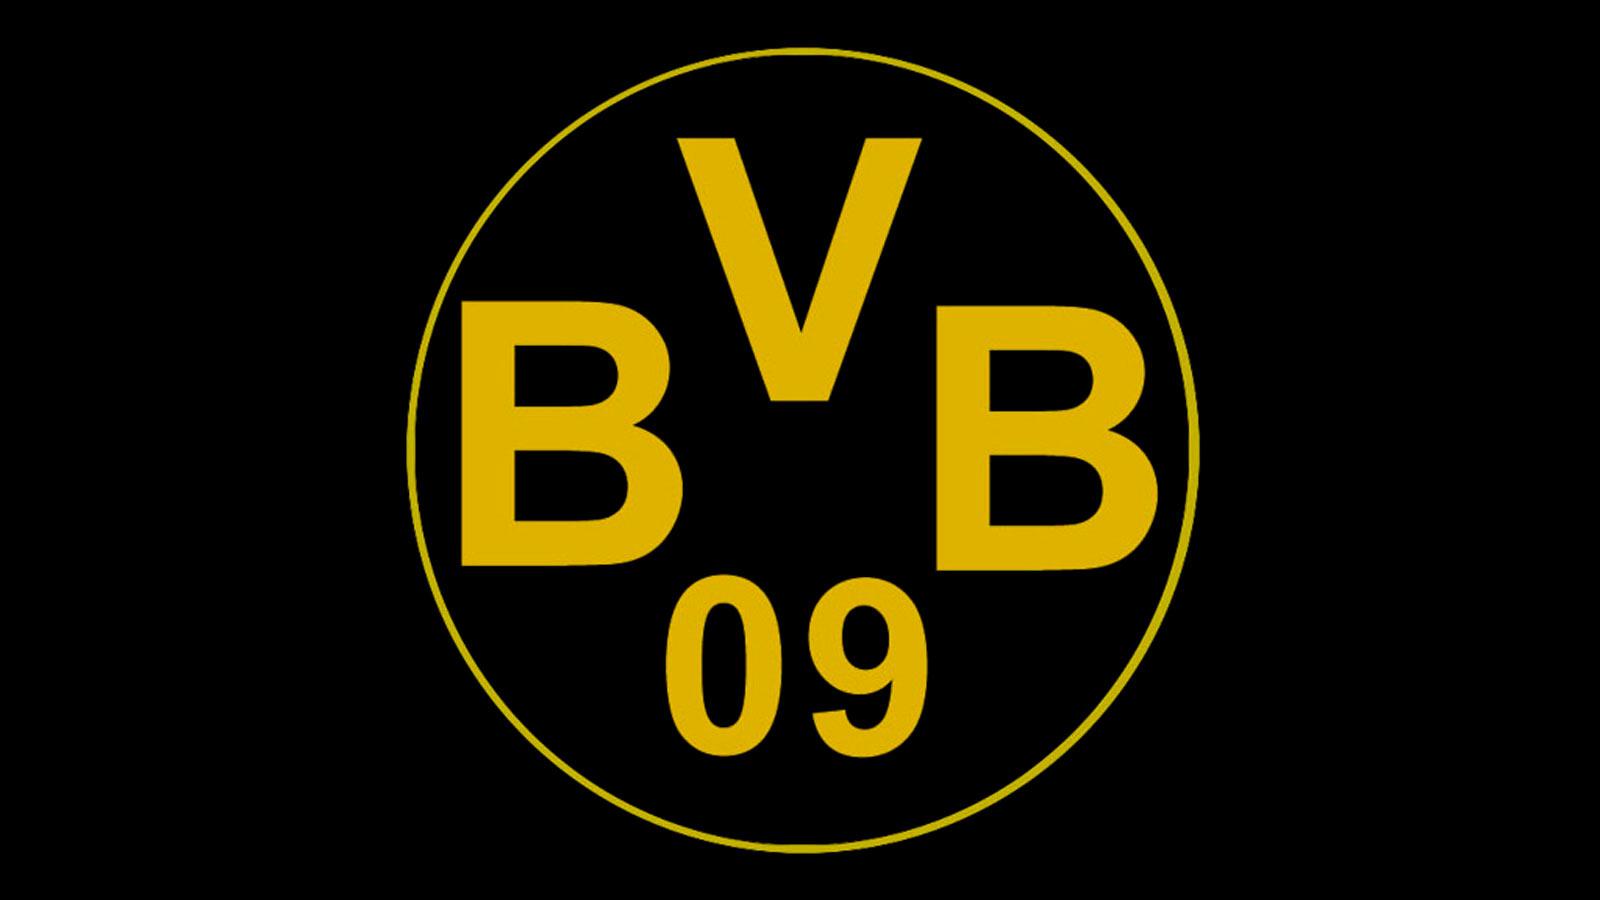 Signal Iduna Park Wallpaper Hd Borussia Dortmund Wallpaper Logo 12237 Wallpaper